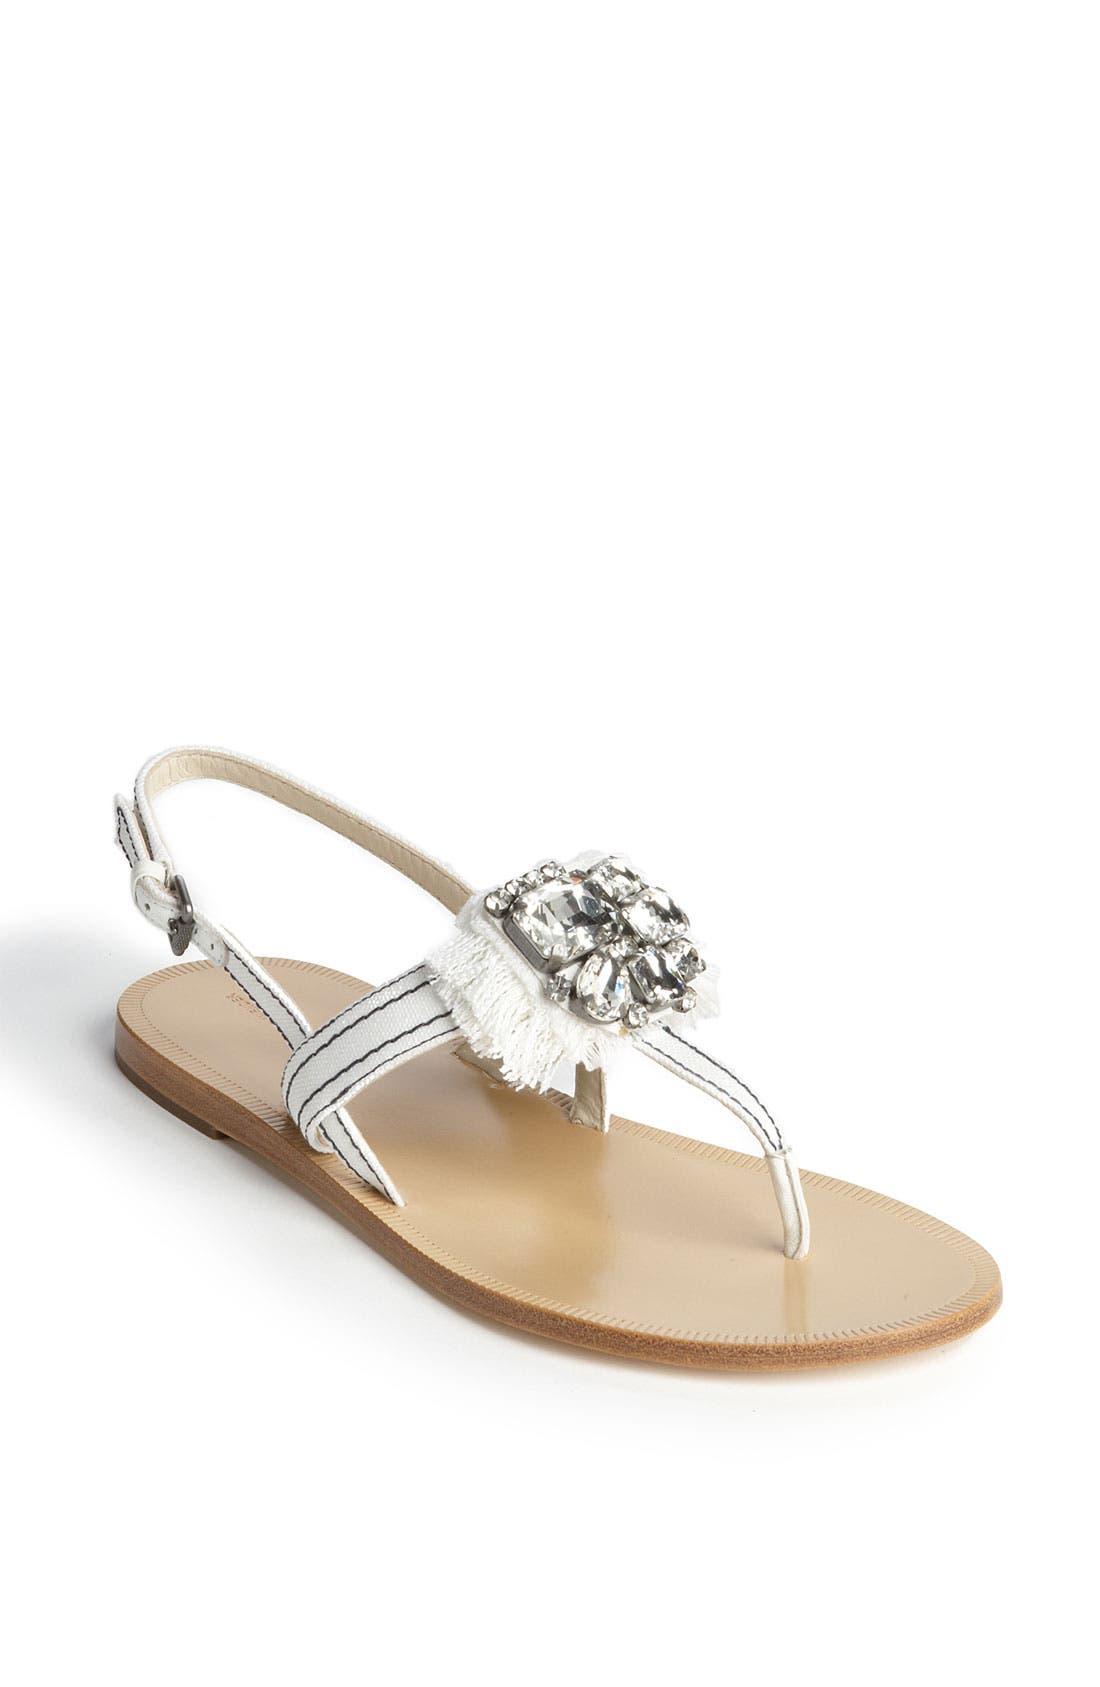 Main Image - Vera Wang Footwear 'Robbie' Sandal